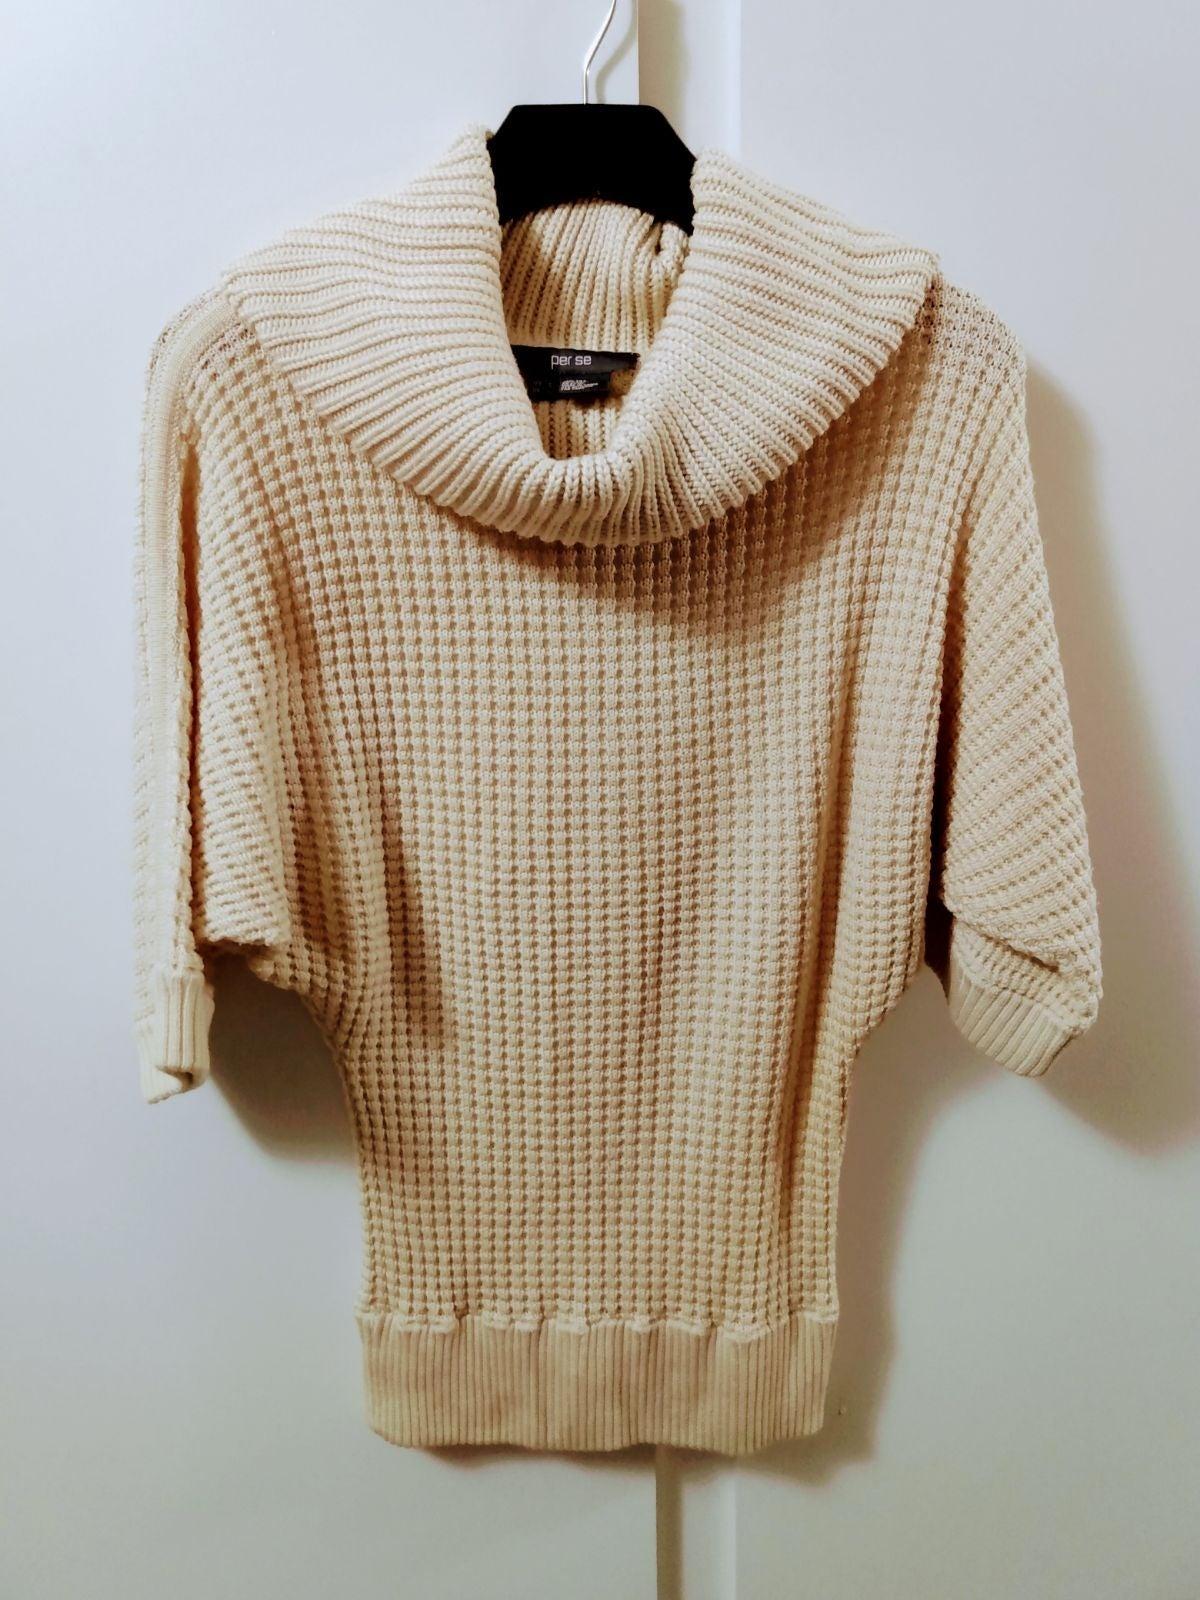 PER SE Knit Dolman Turtleneck Sweater